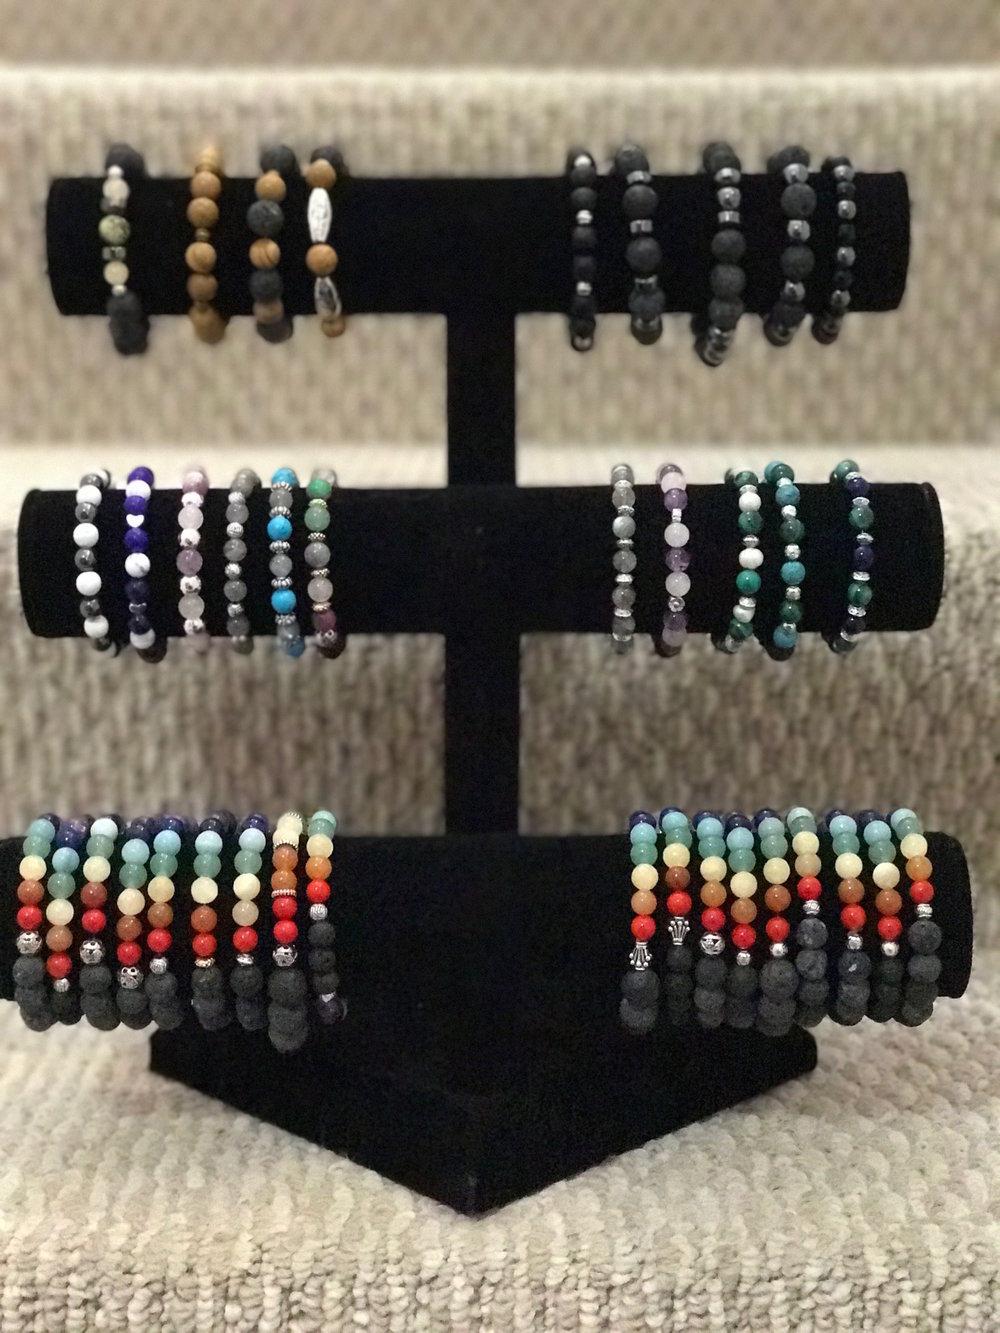 bracelet-pic-on-stand.jpg